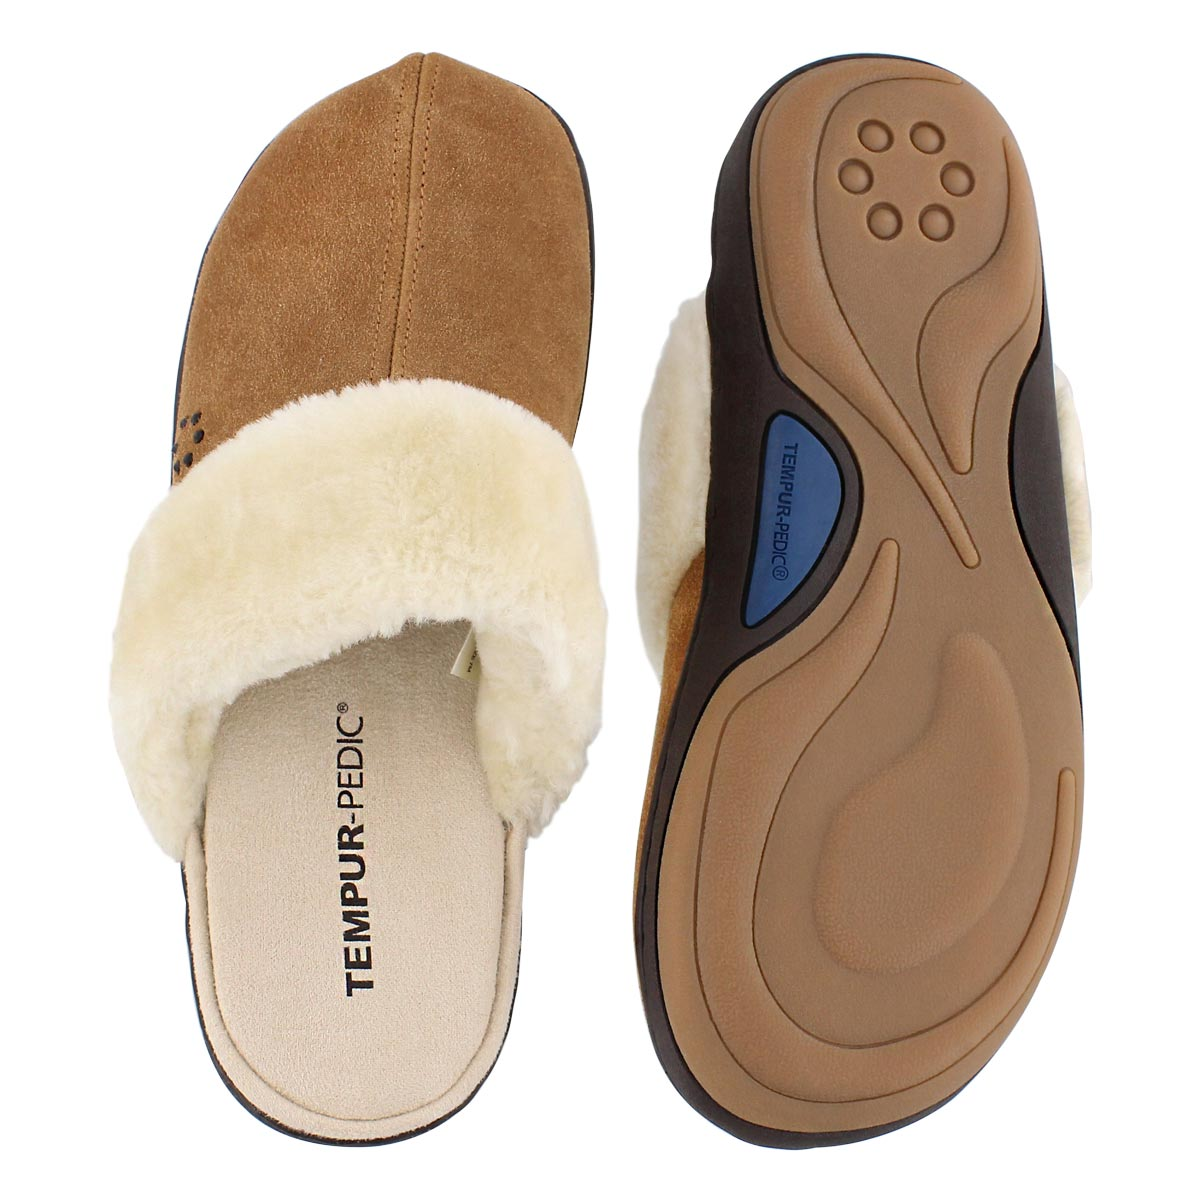 Lds Kensley hashbrown open back slipper